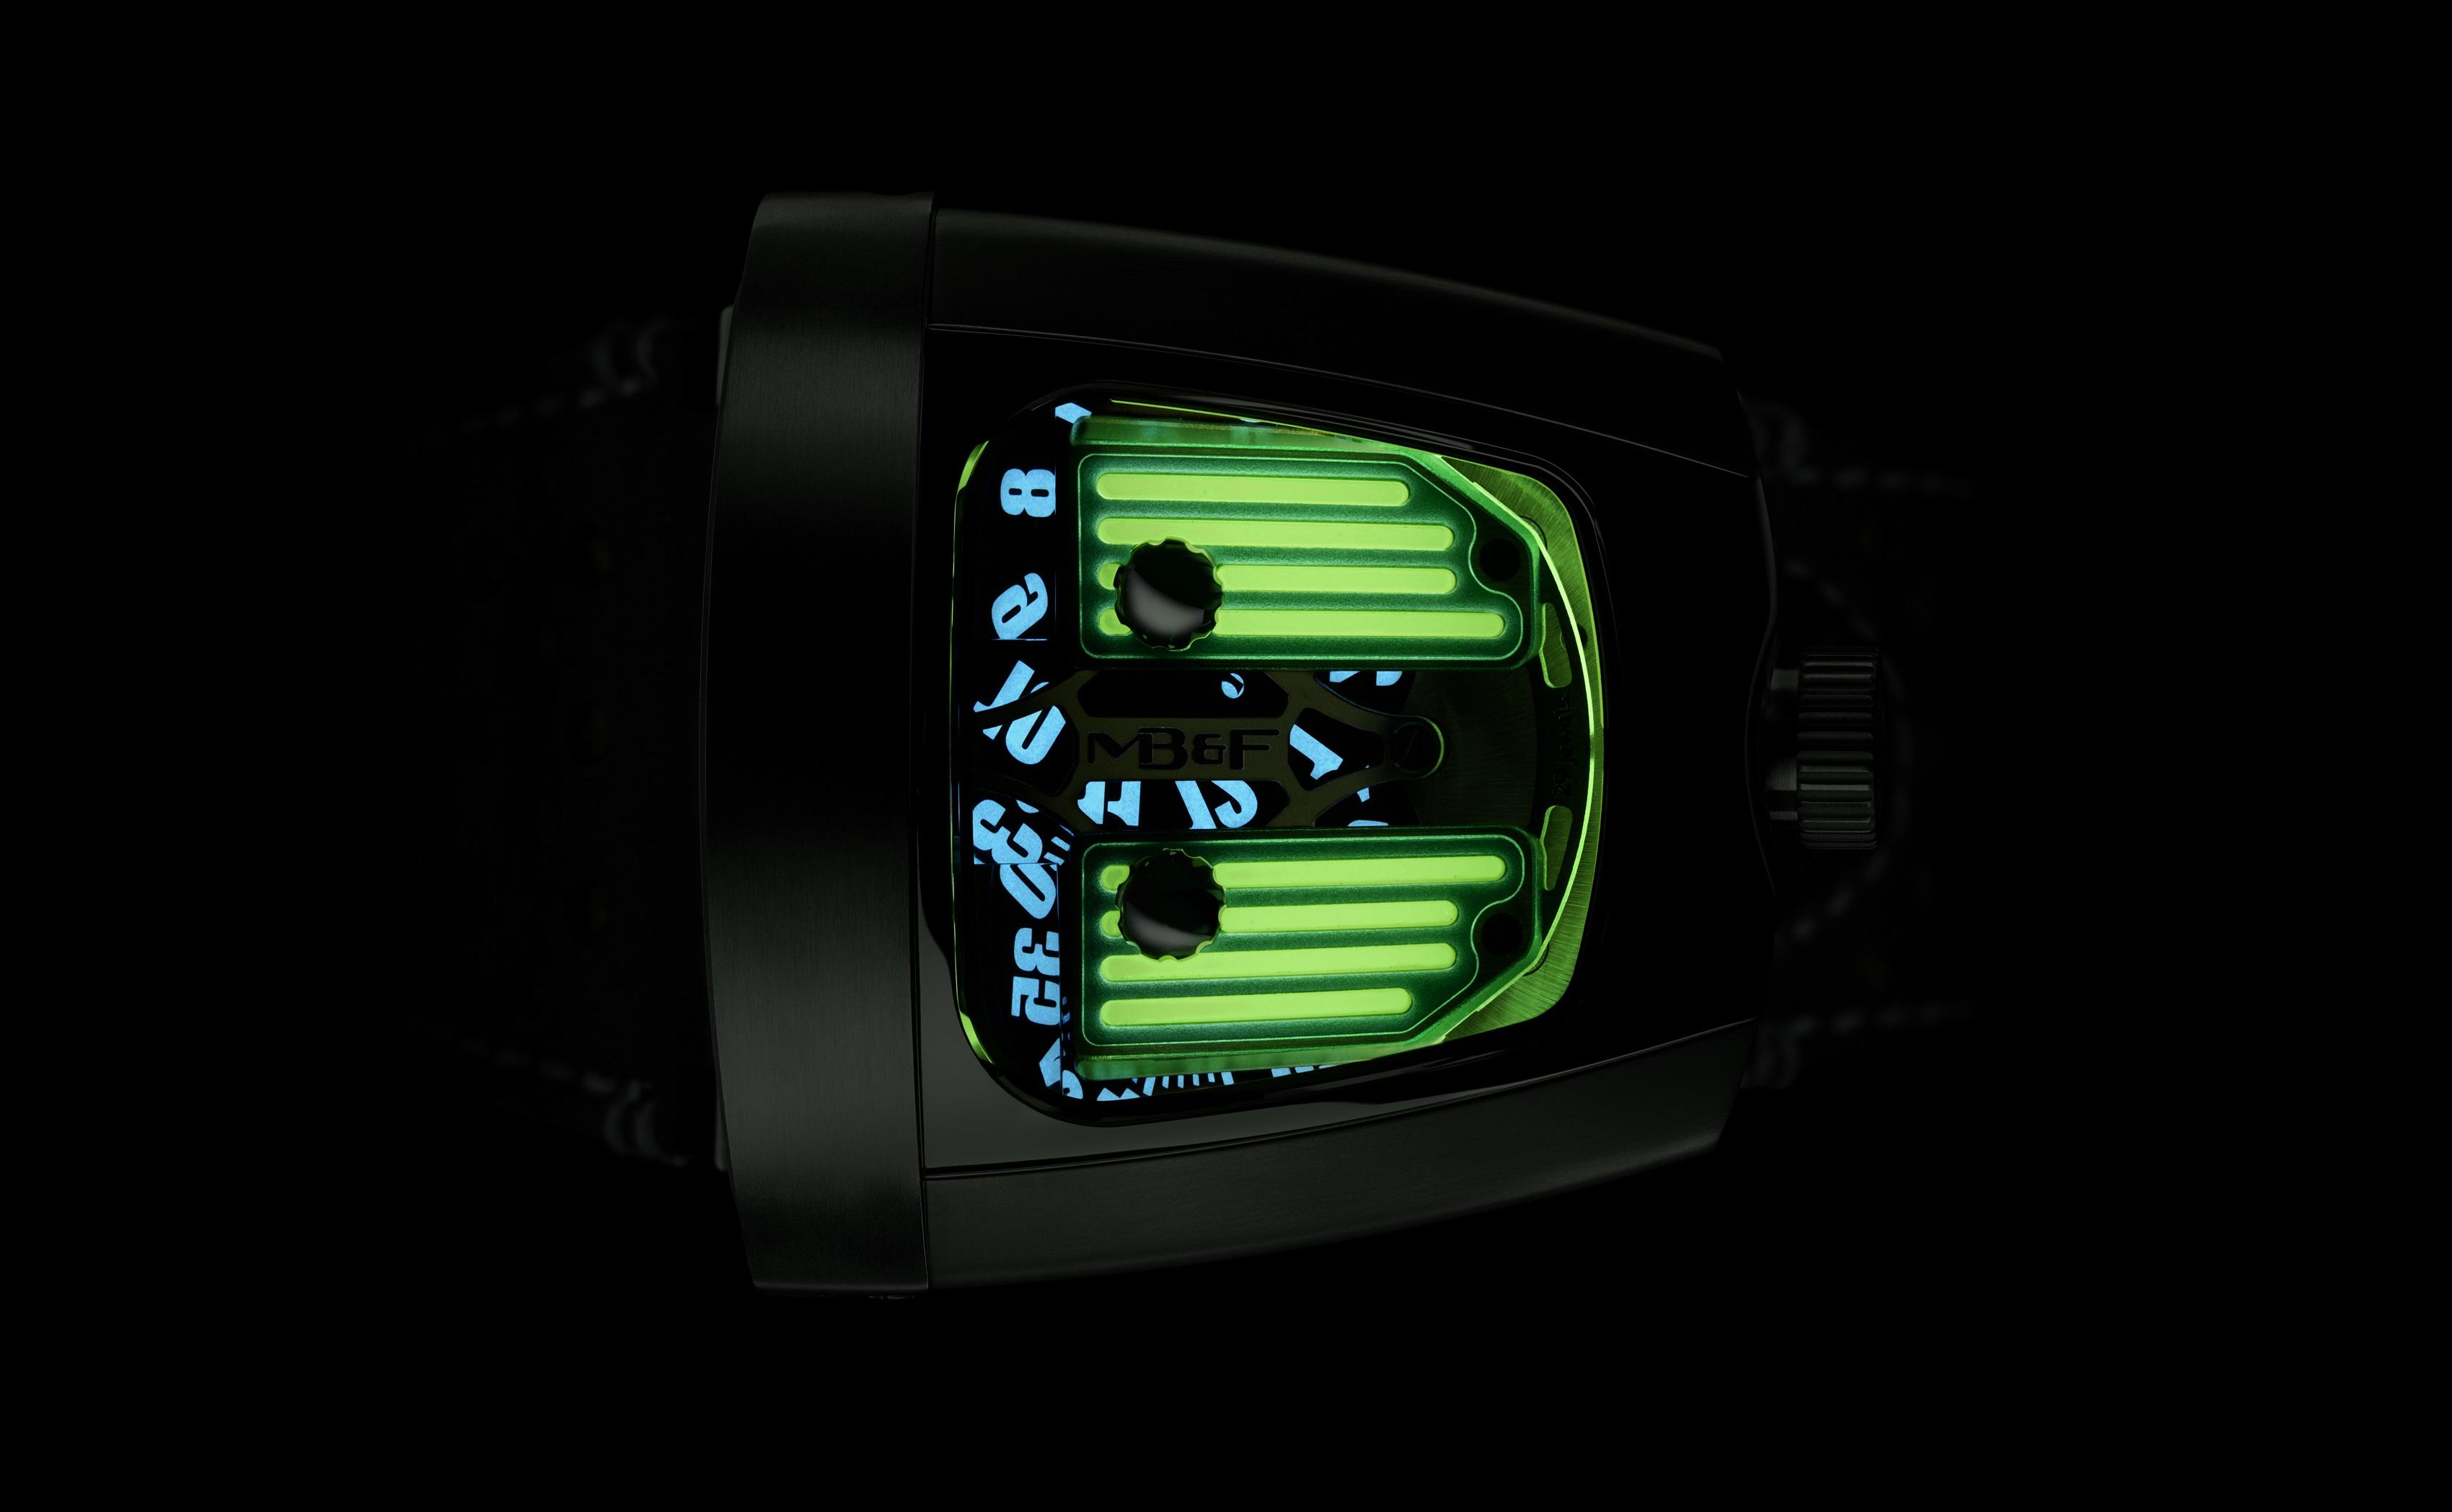 HMX BLACK BADGER GREEN